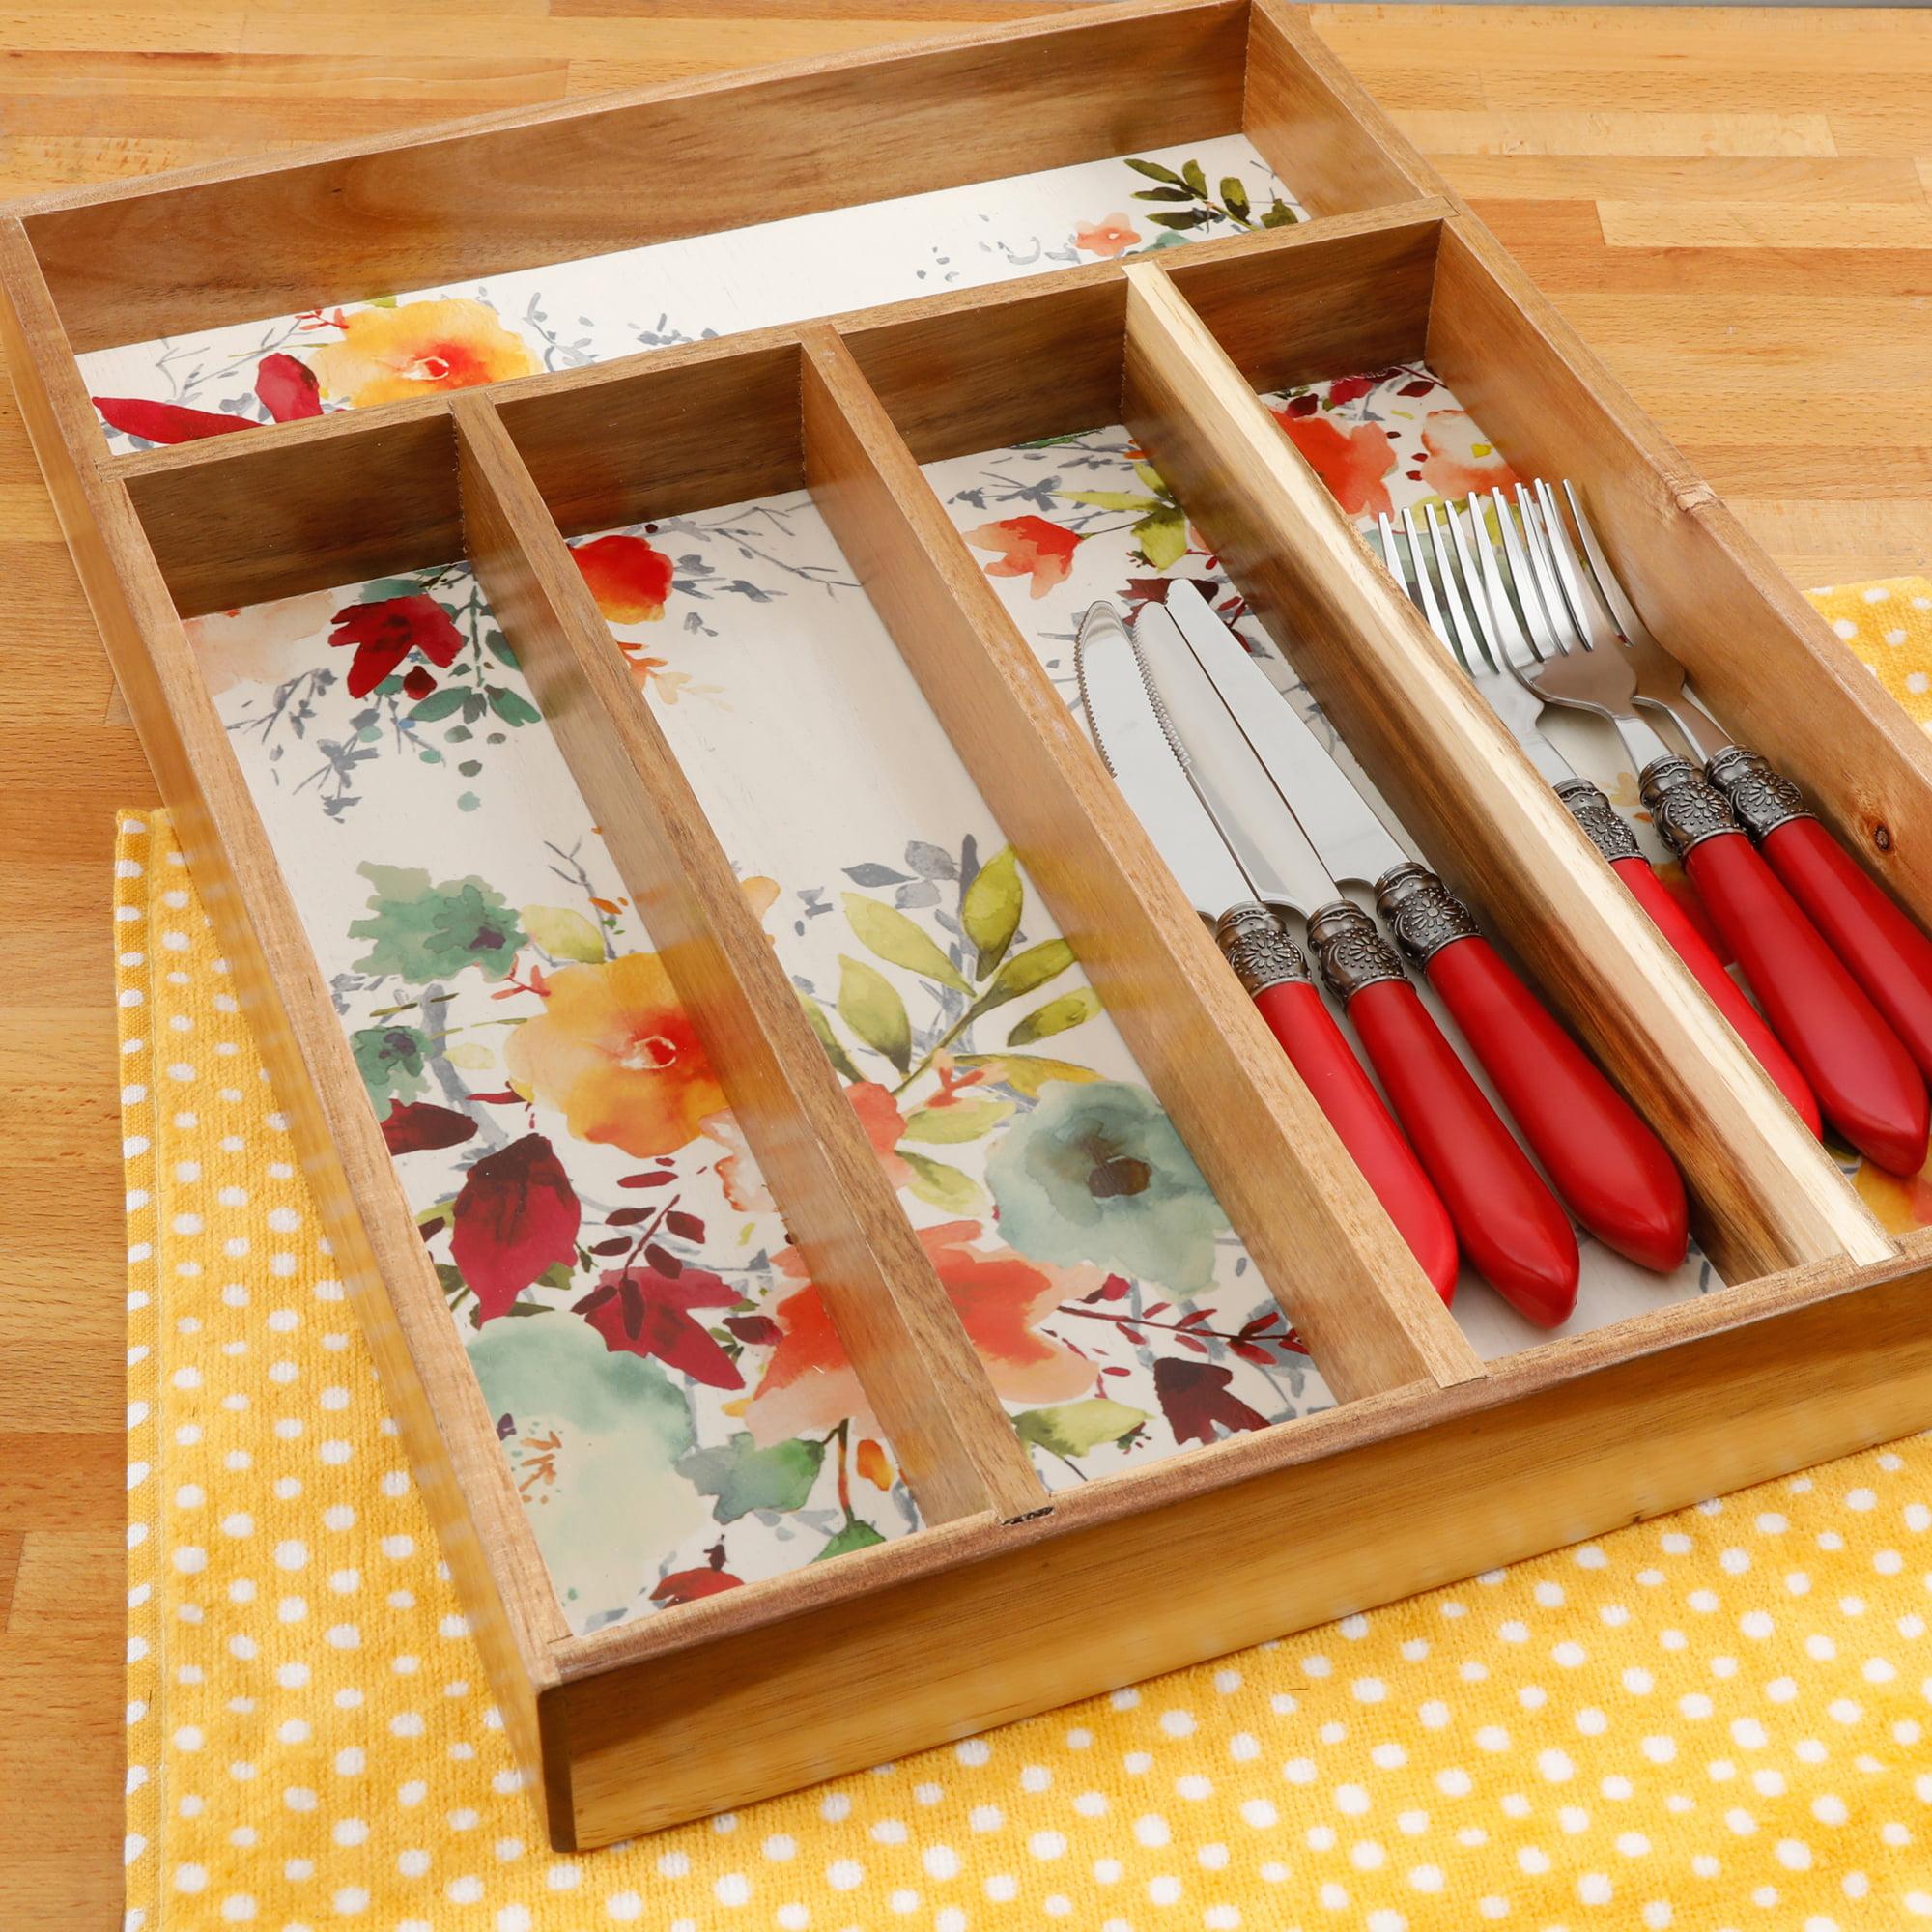 The Pioneer Woman Cutlery Tray Holder Tidy Drawer Storage Organizer Kitchen USA